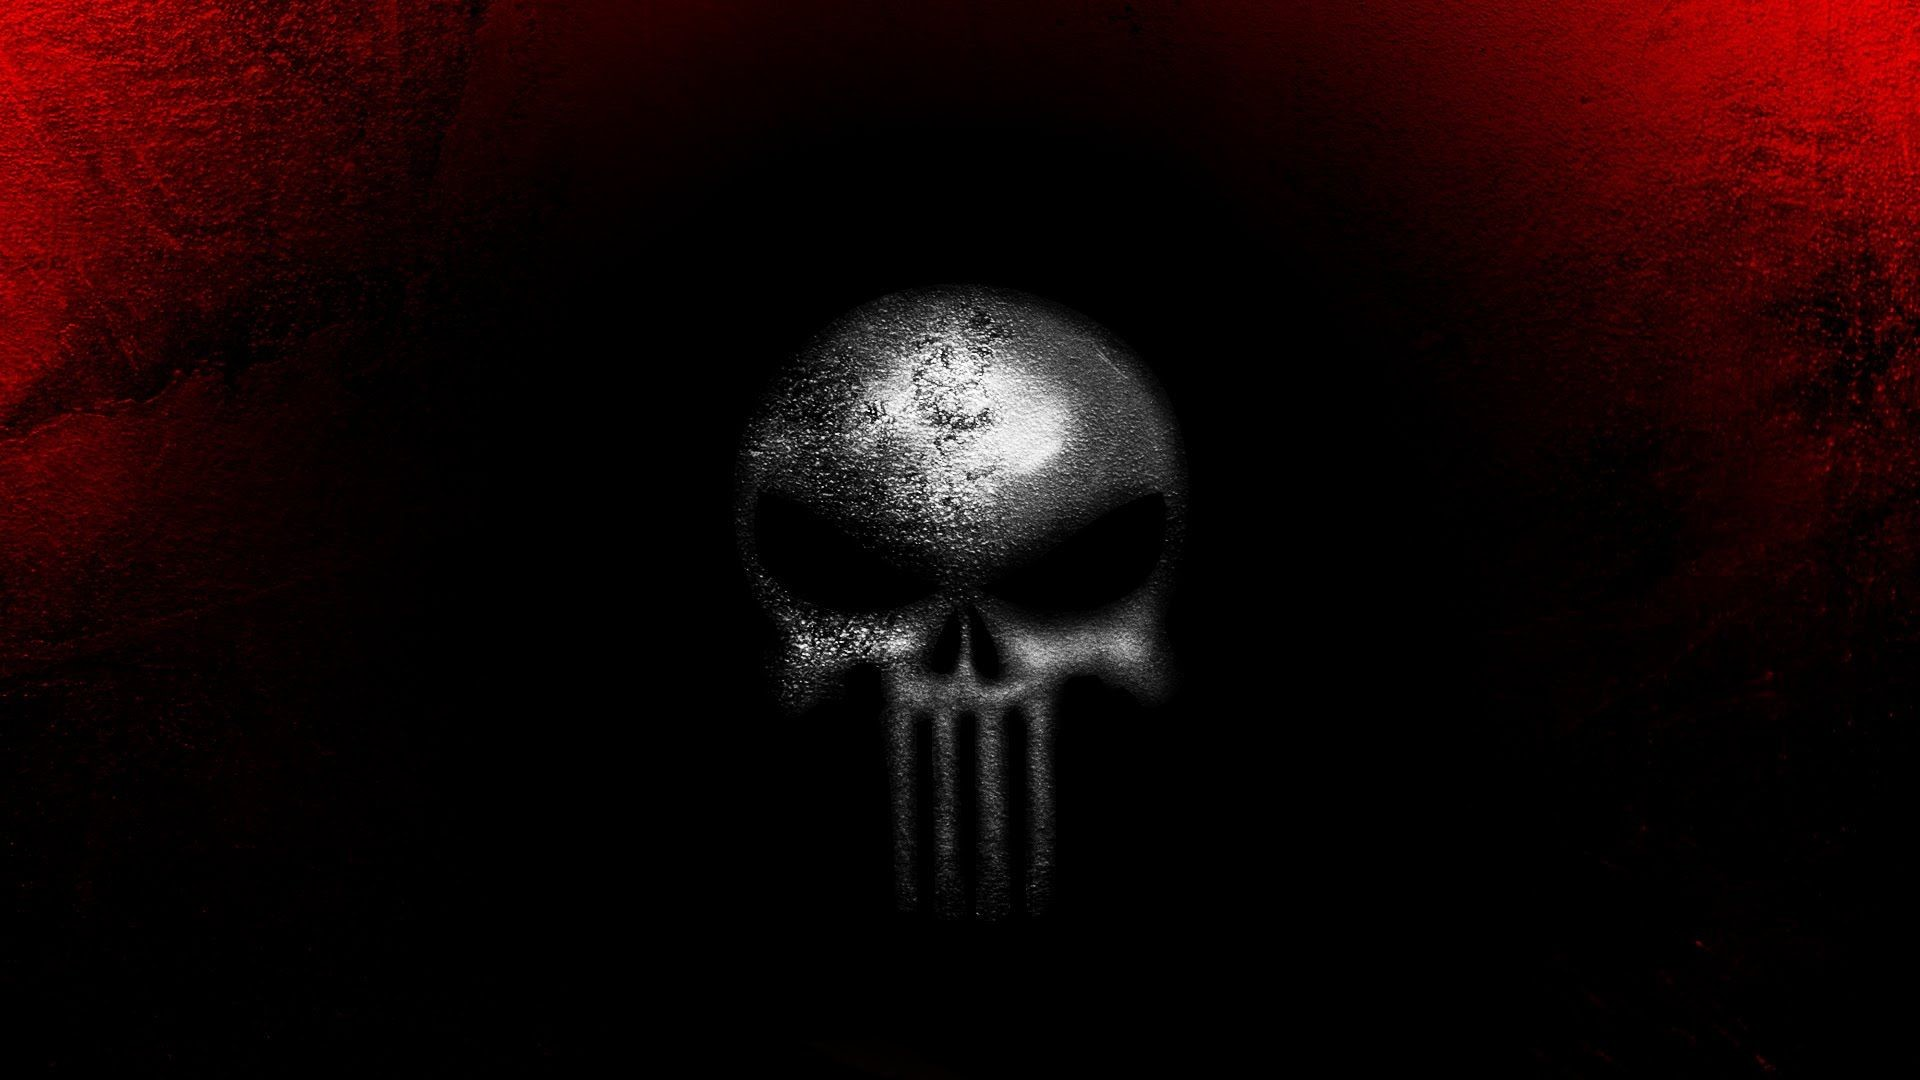 Res: 1920x1080, THRASH METAL MEGA Playlist - Metallica, Megadeth, Slayer, Anthrax, Exodu.